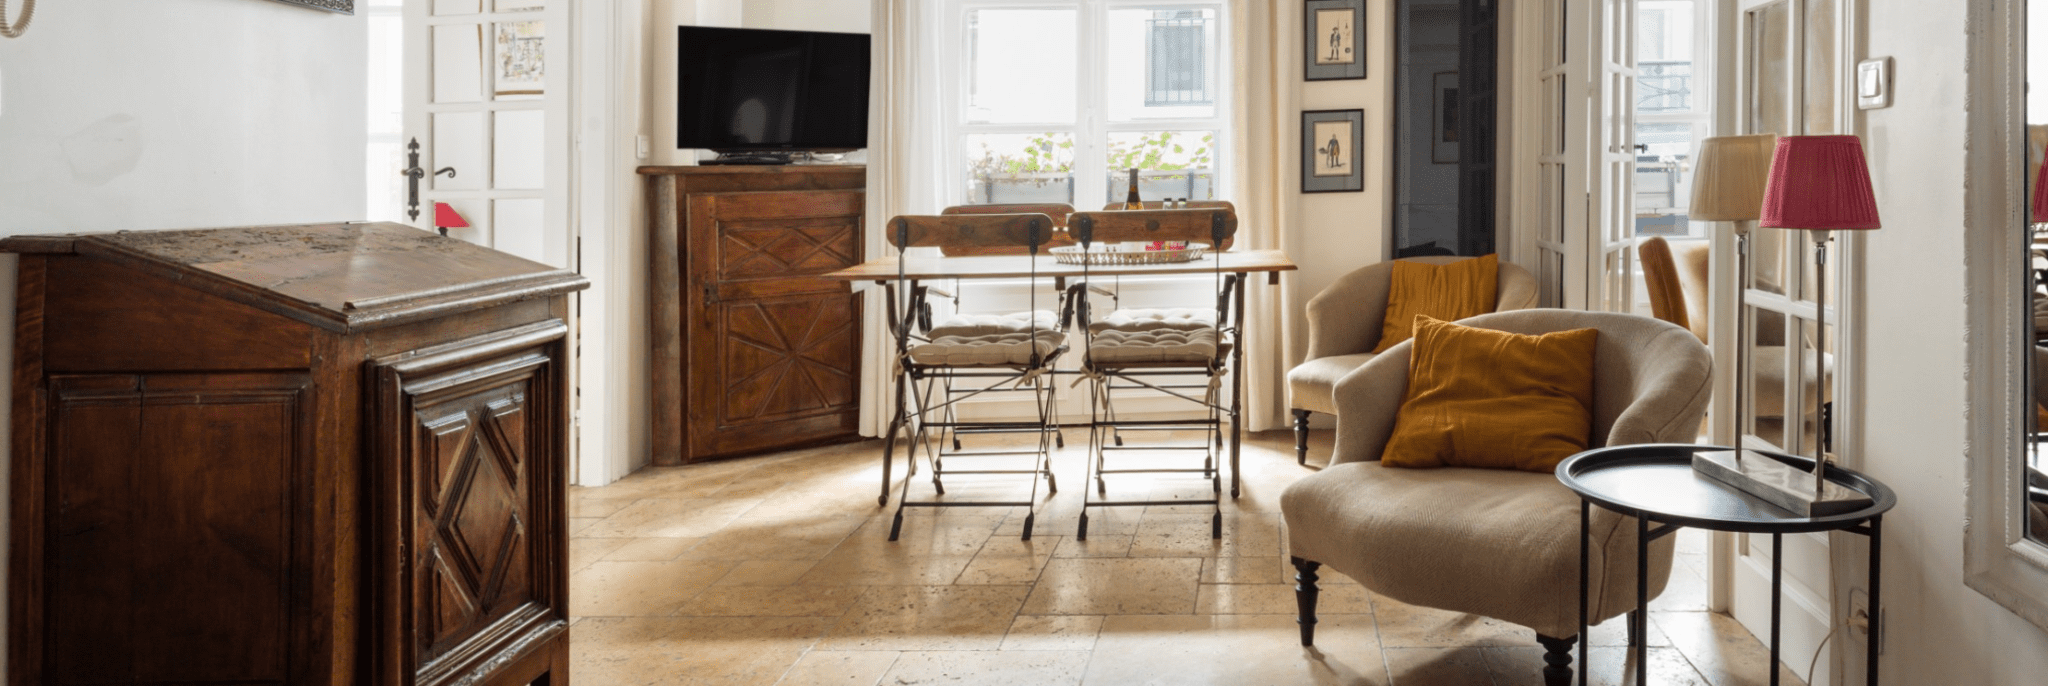 airbnb marais apartment paris